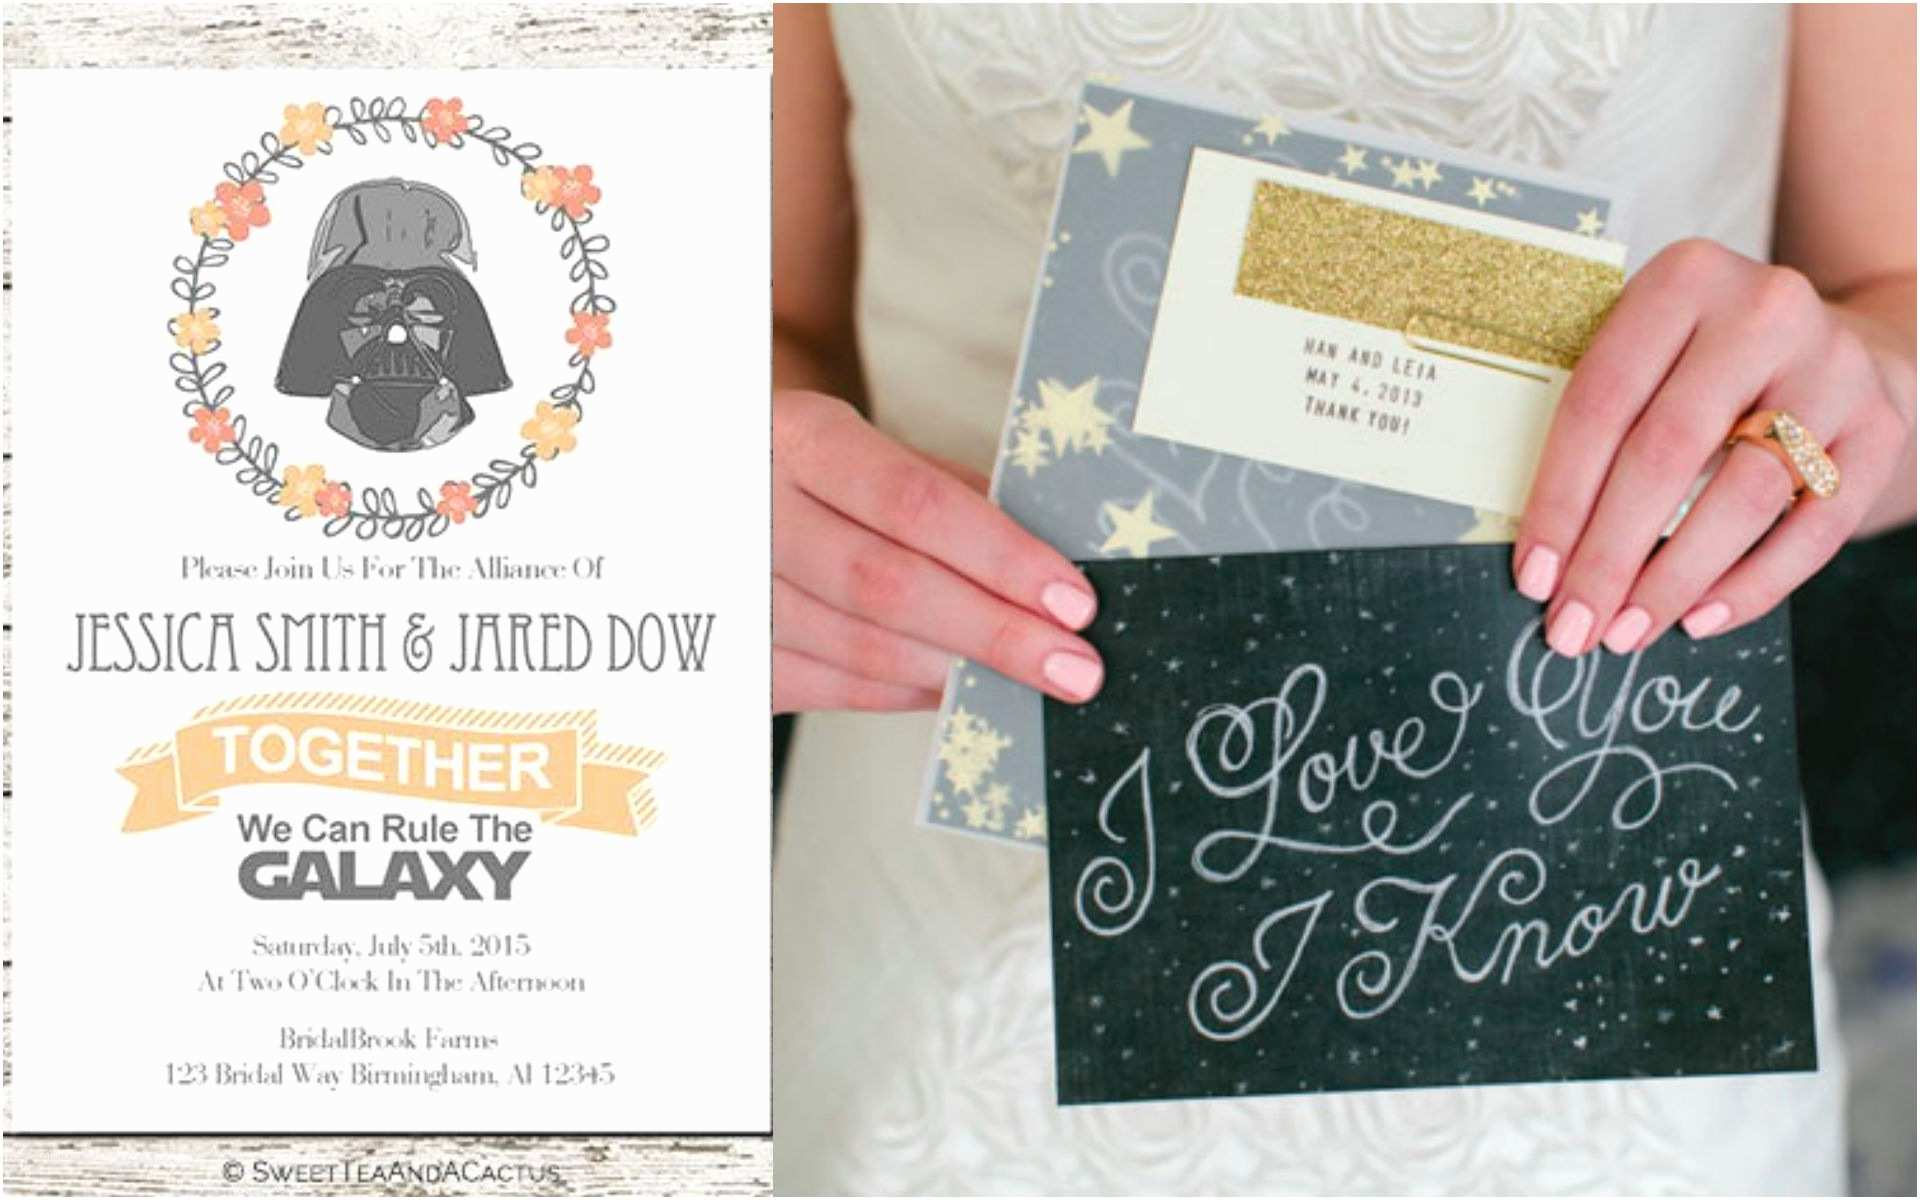 Star Wars Wedding Invitations Star Wars Wedding Ideas